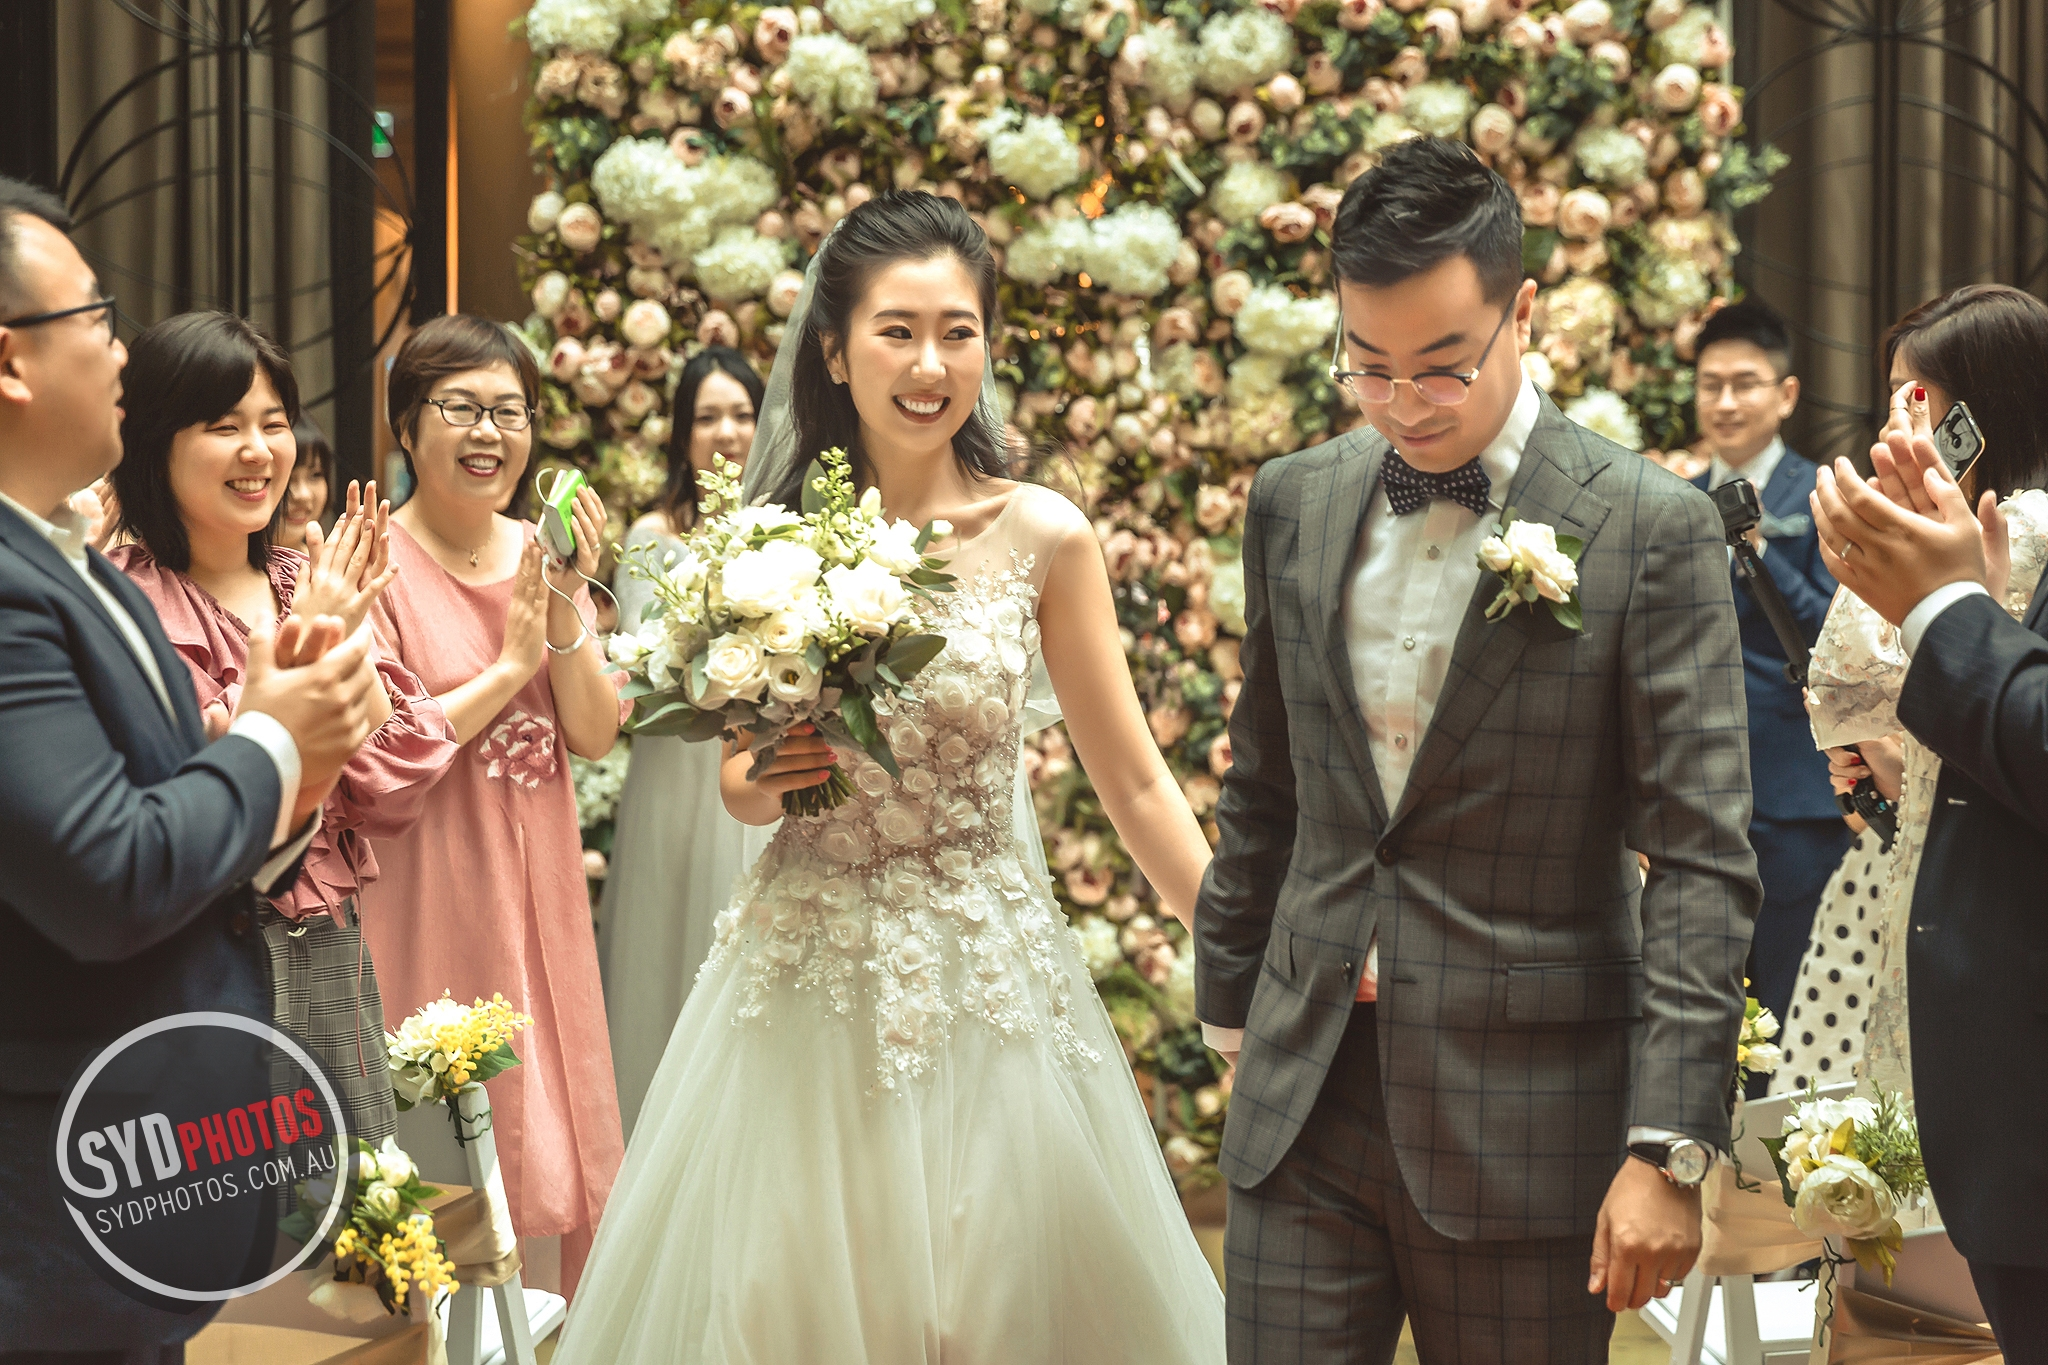 ID-106258-Hannah Zhang-Wedding-悉尼婚礼摄影